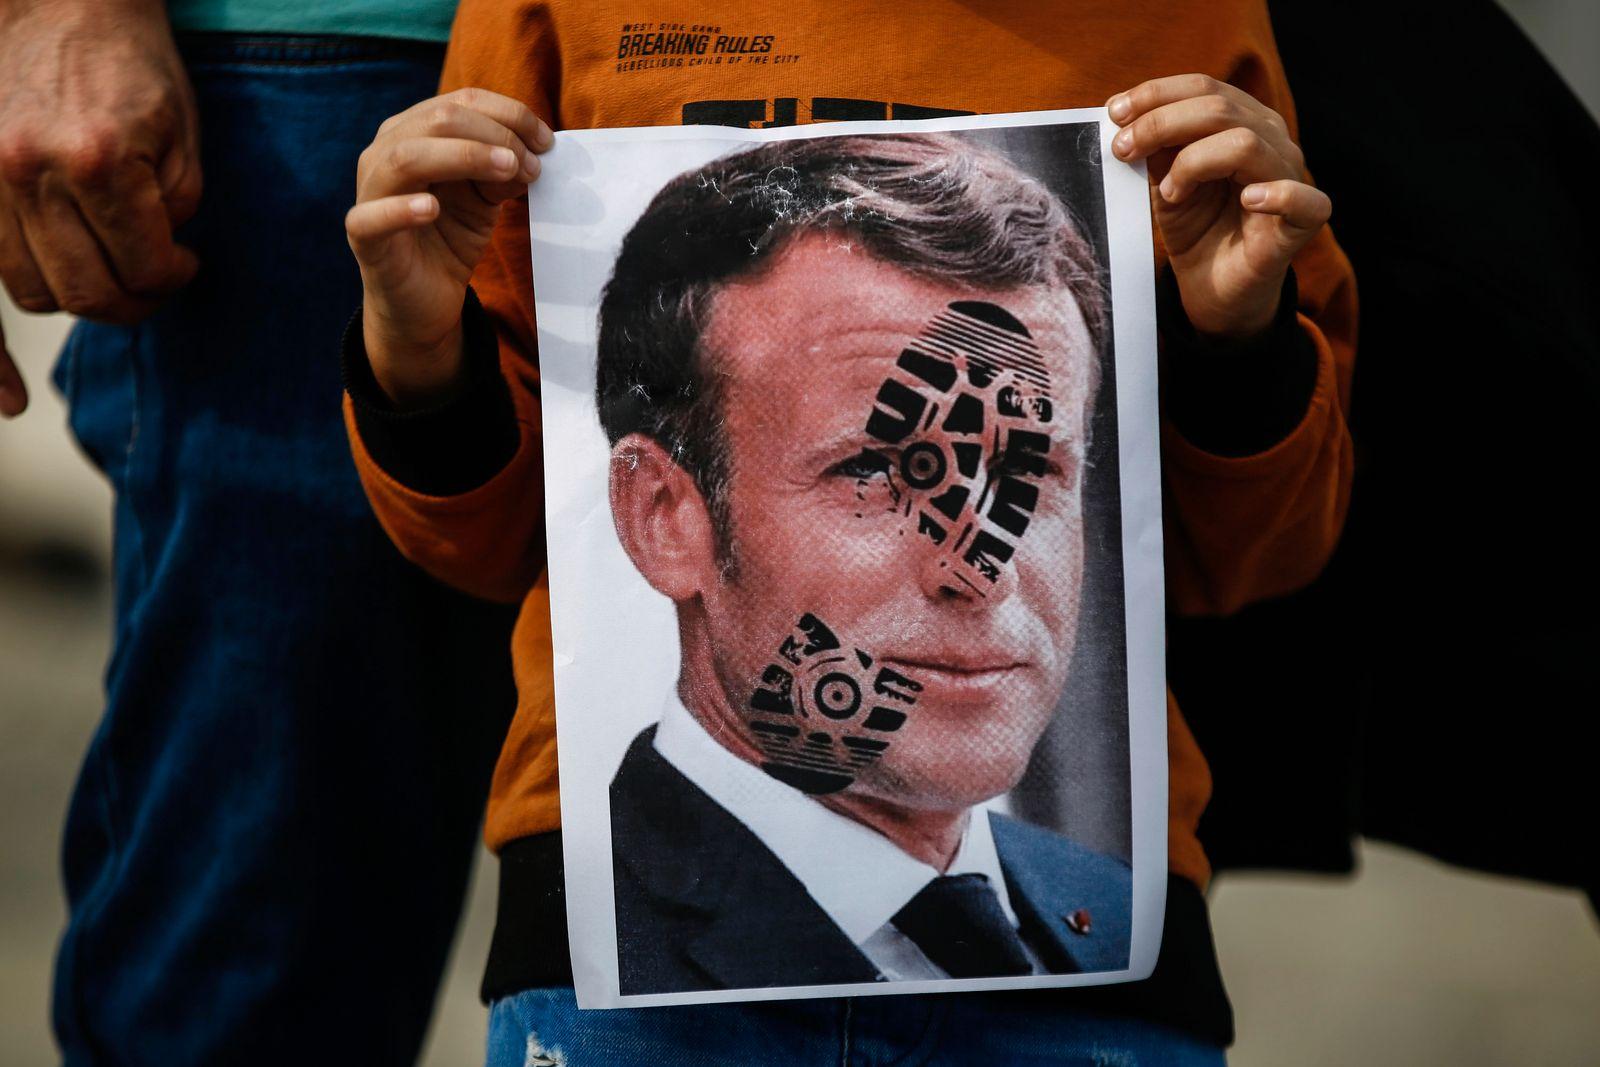 Turkey France Protest